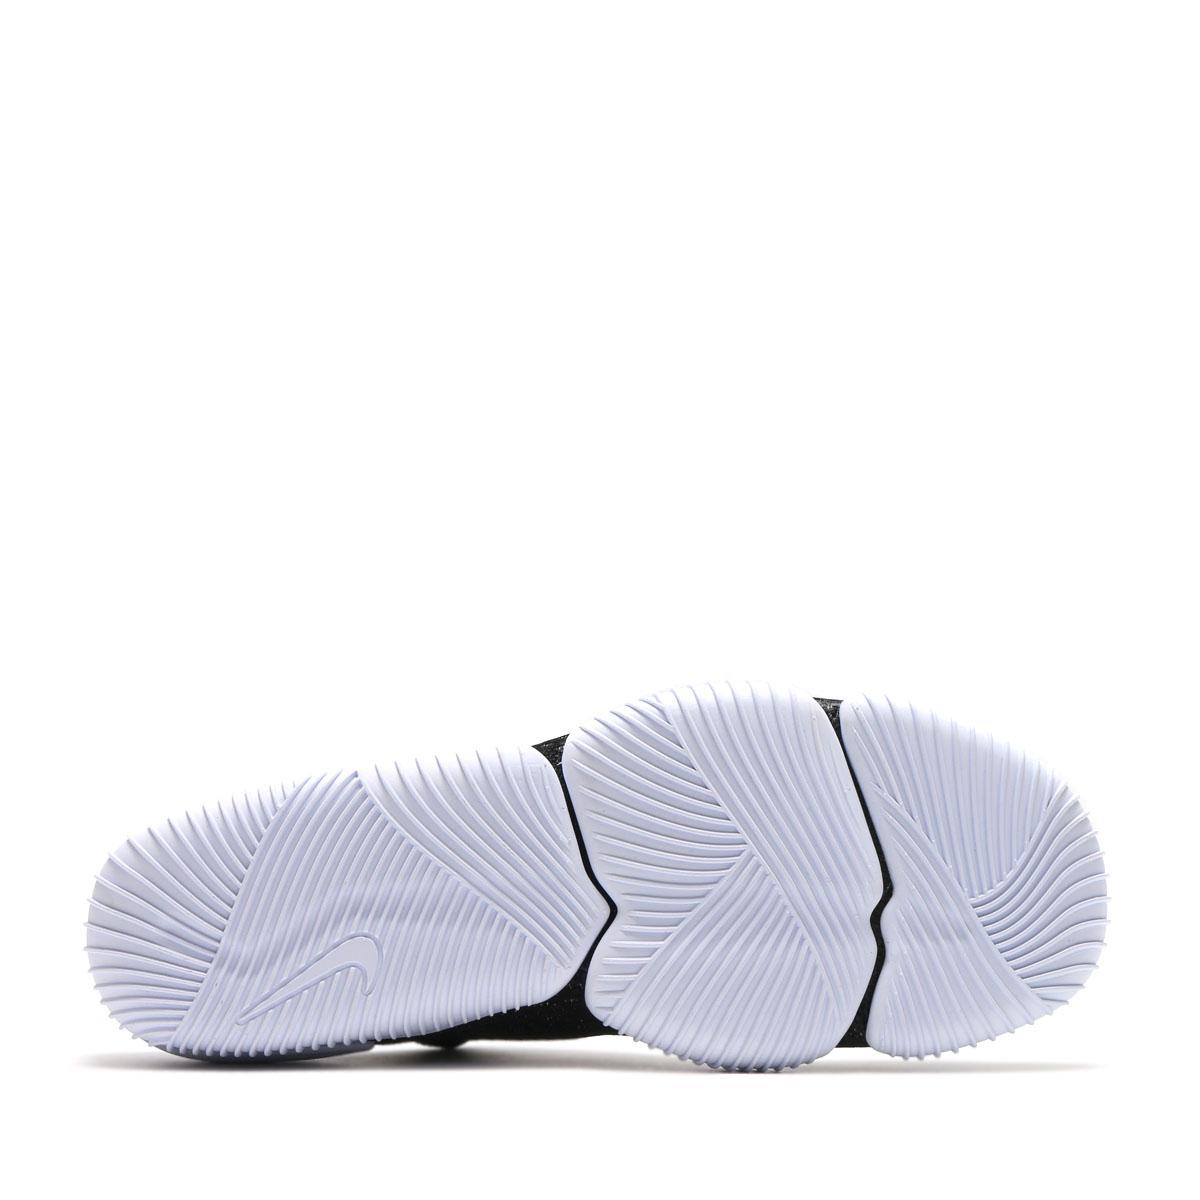 NIKE AQUA SOCK 360 (나이키아크아속크 360) BLACK/BLACK-WHITE-WHITE [맨즈 레이디스 스니커] 17 SU-I